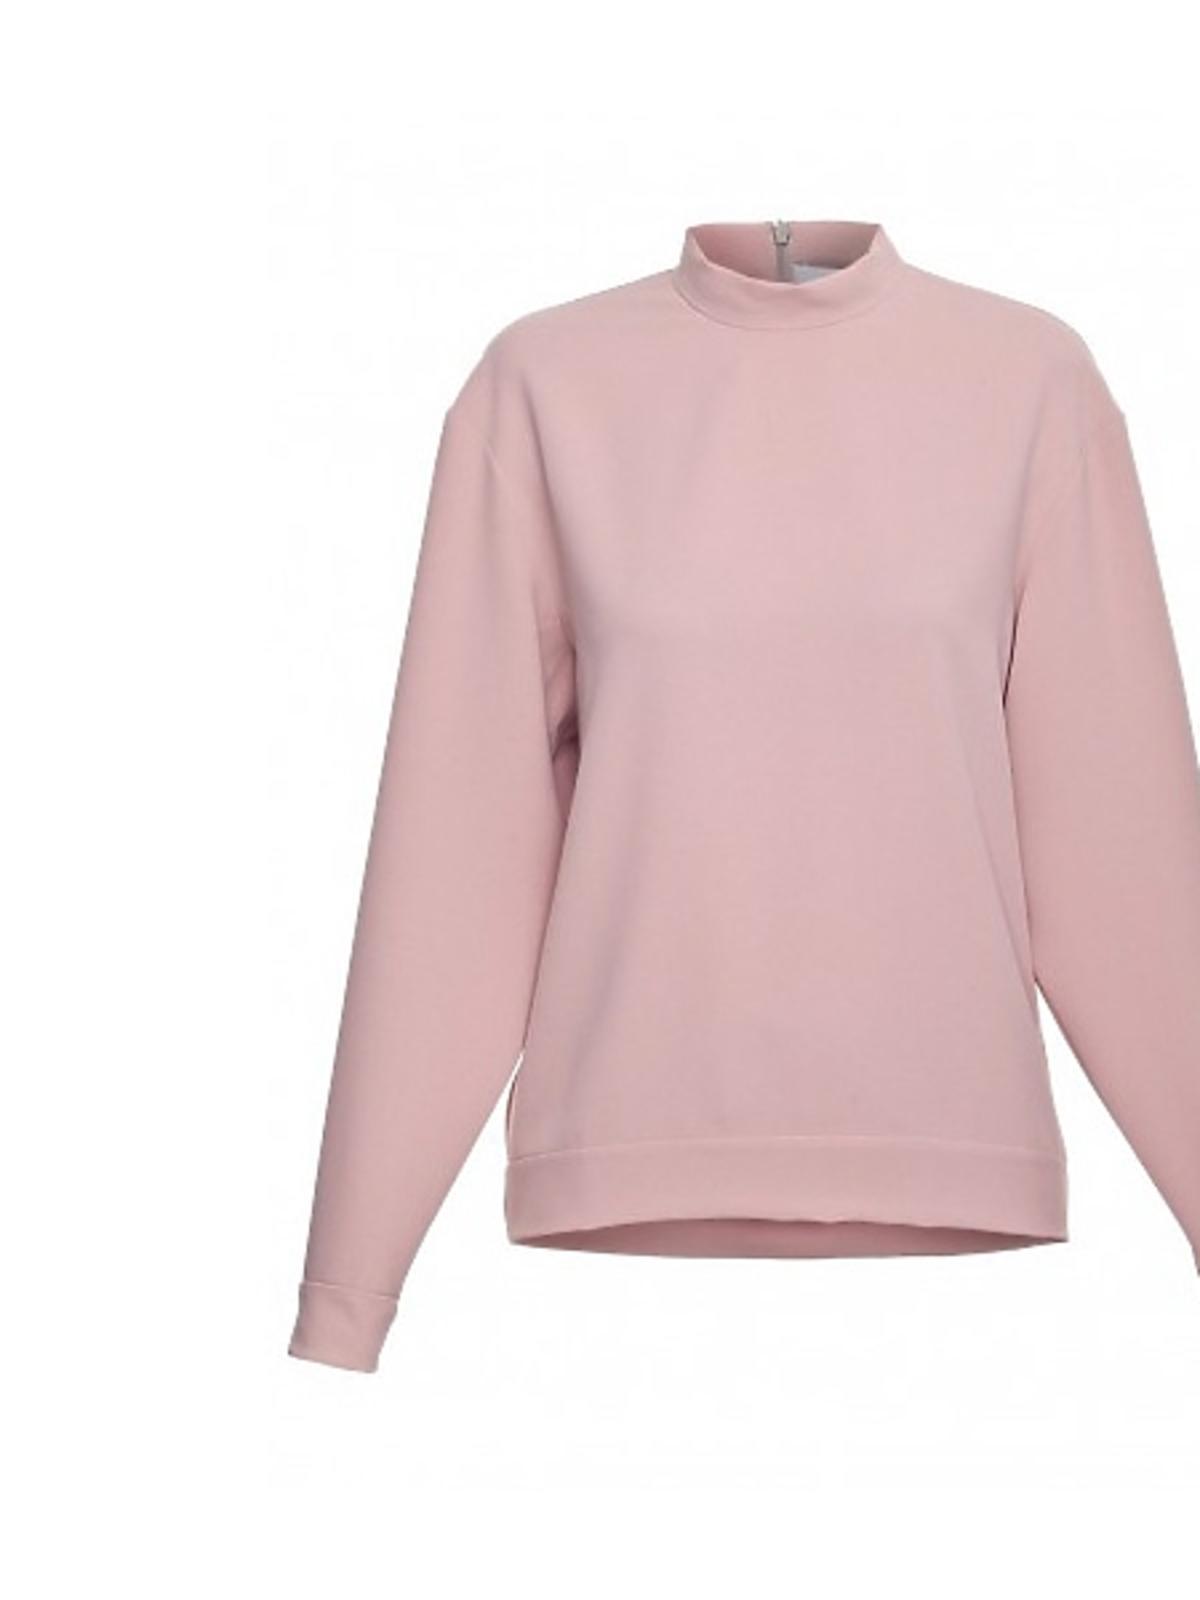 Różowa bluzka Tomaotomo, cena